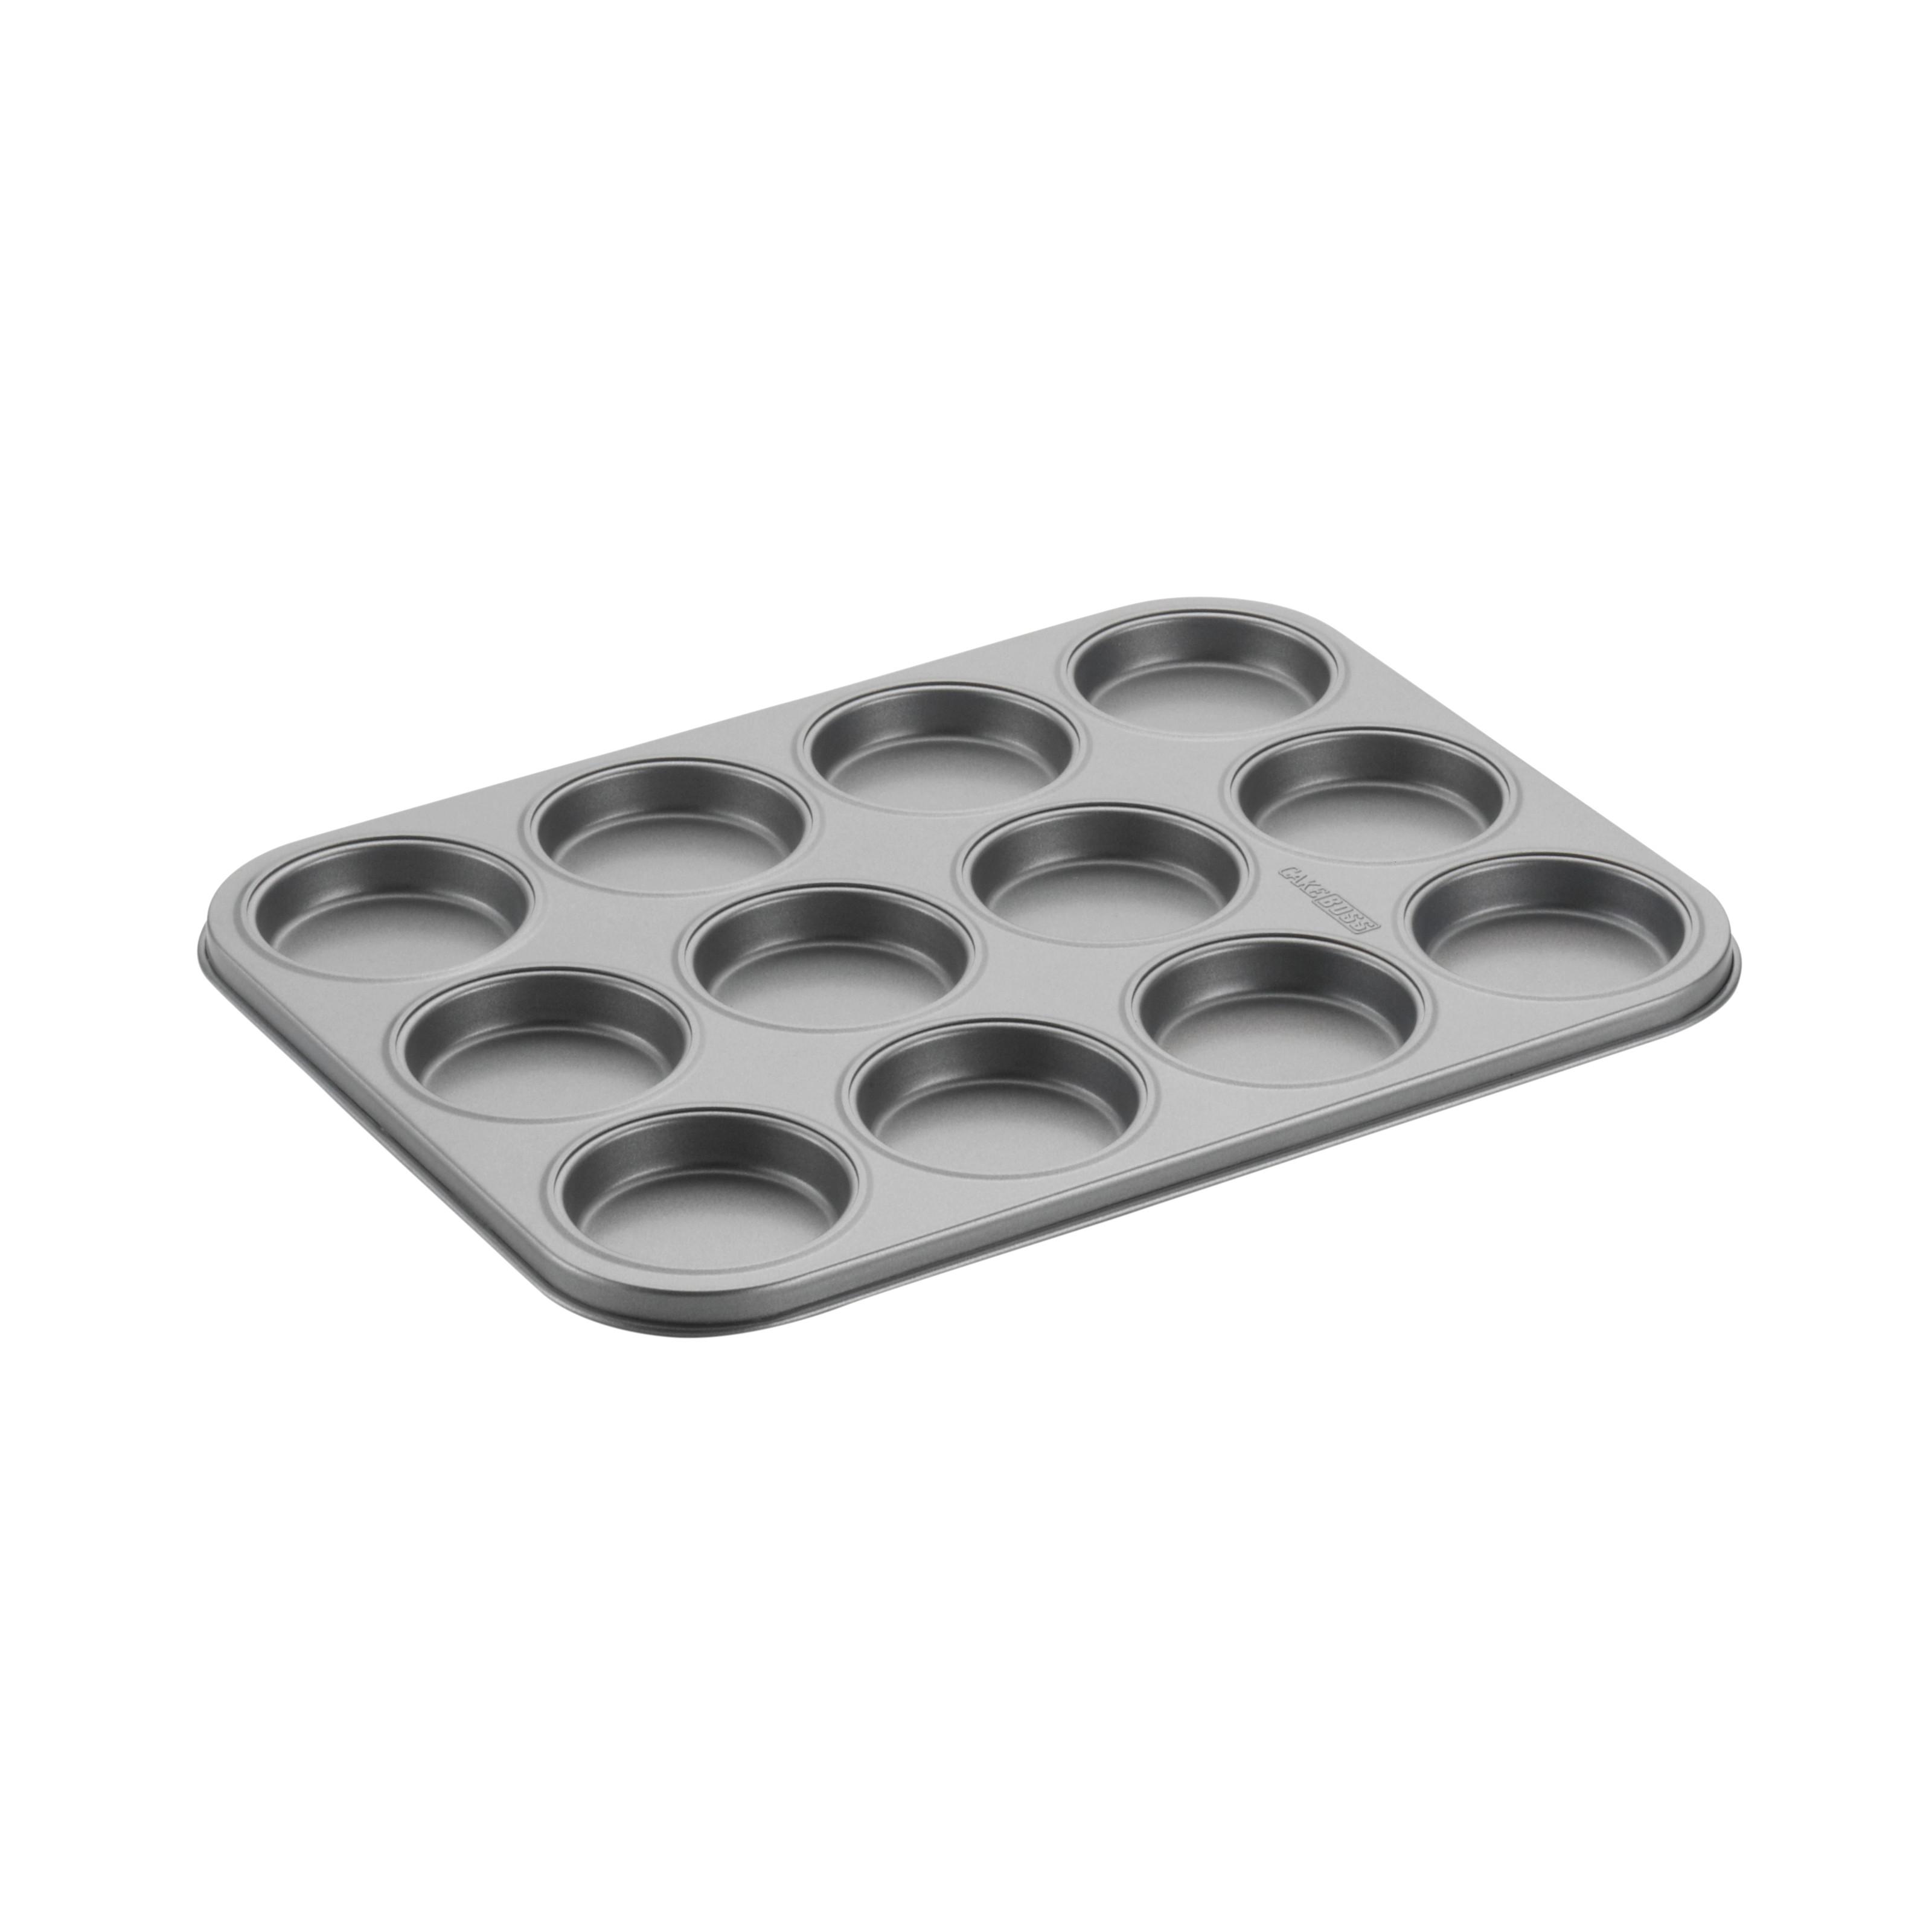 Cake Boss Novelty Nonstick Bakeware 12-Cup Whoopie Pie Pan, Gray